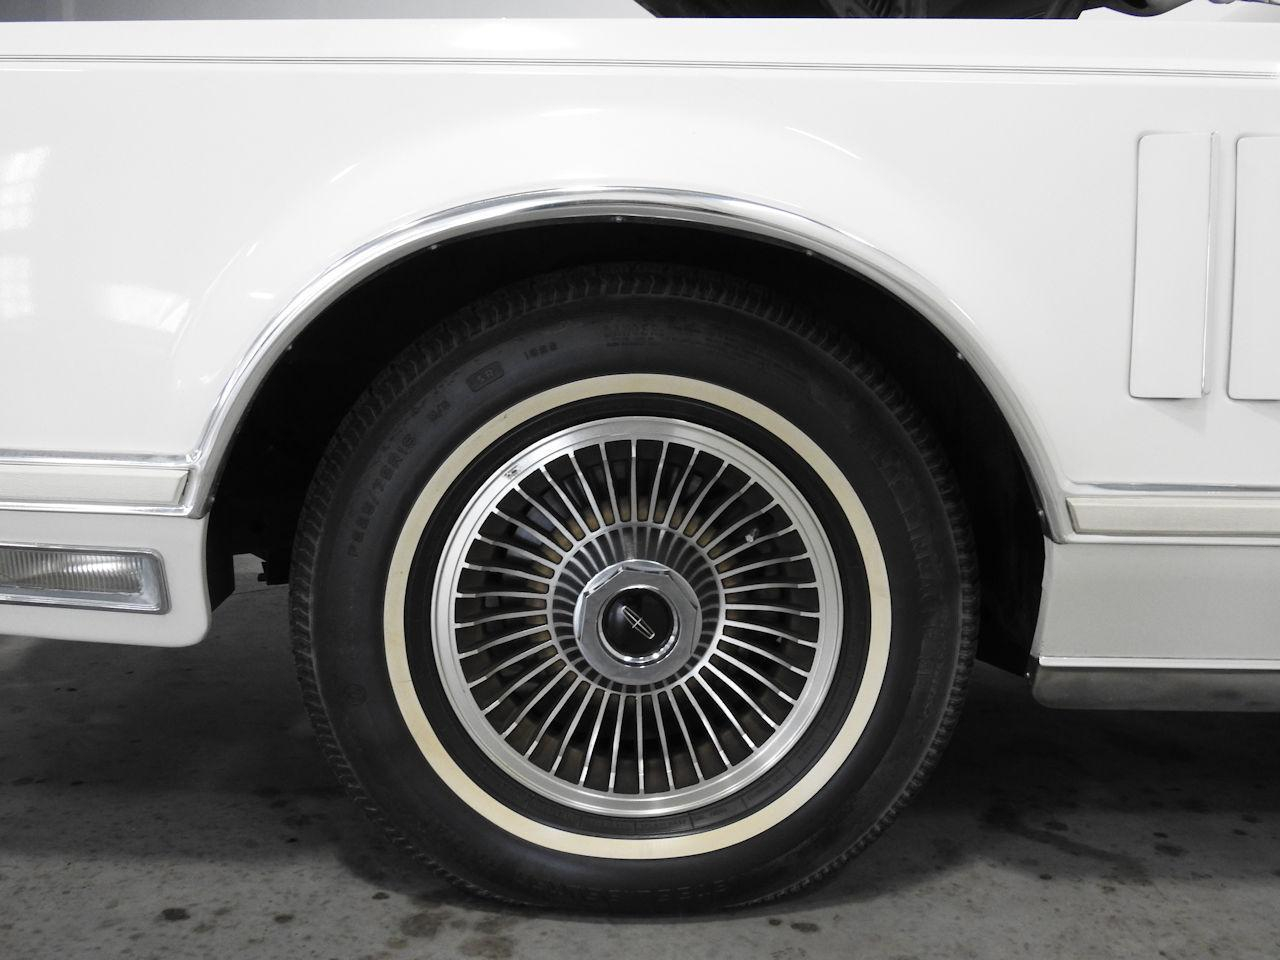 1979 Lincoln MKV 87